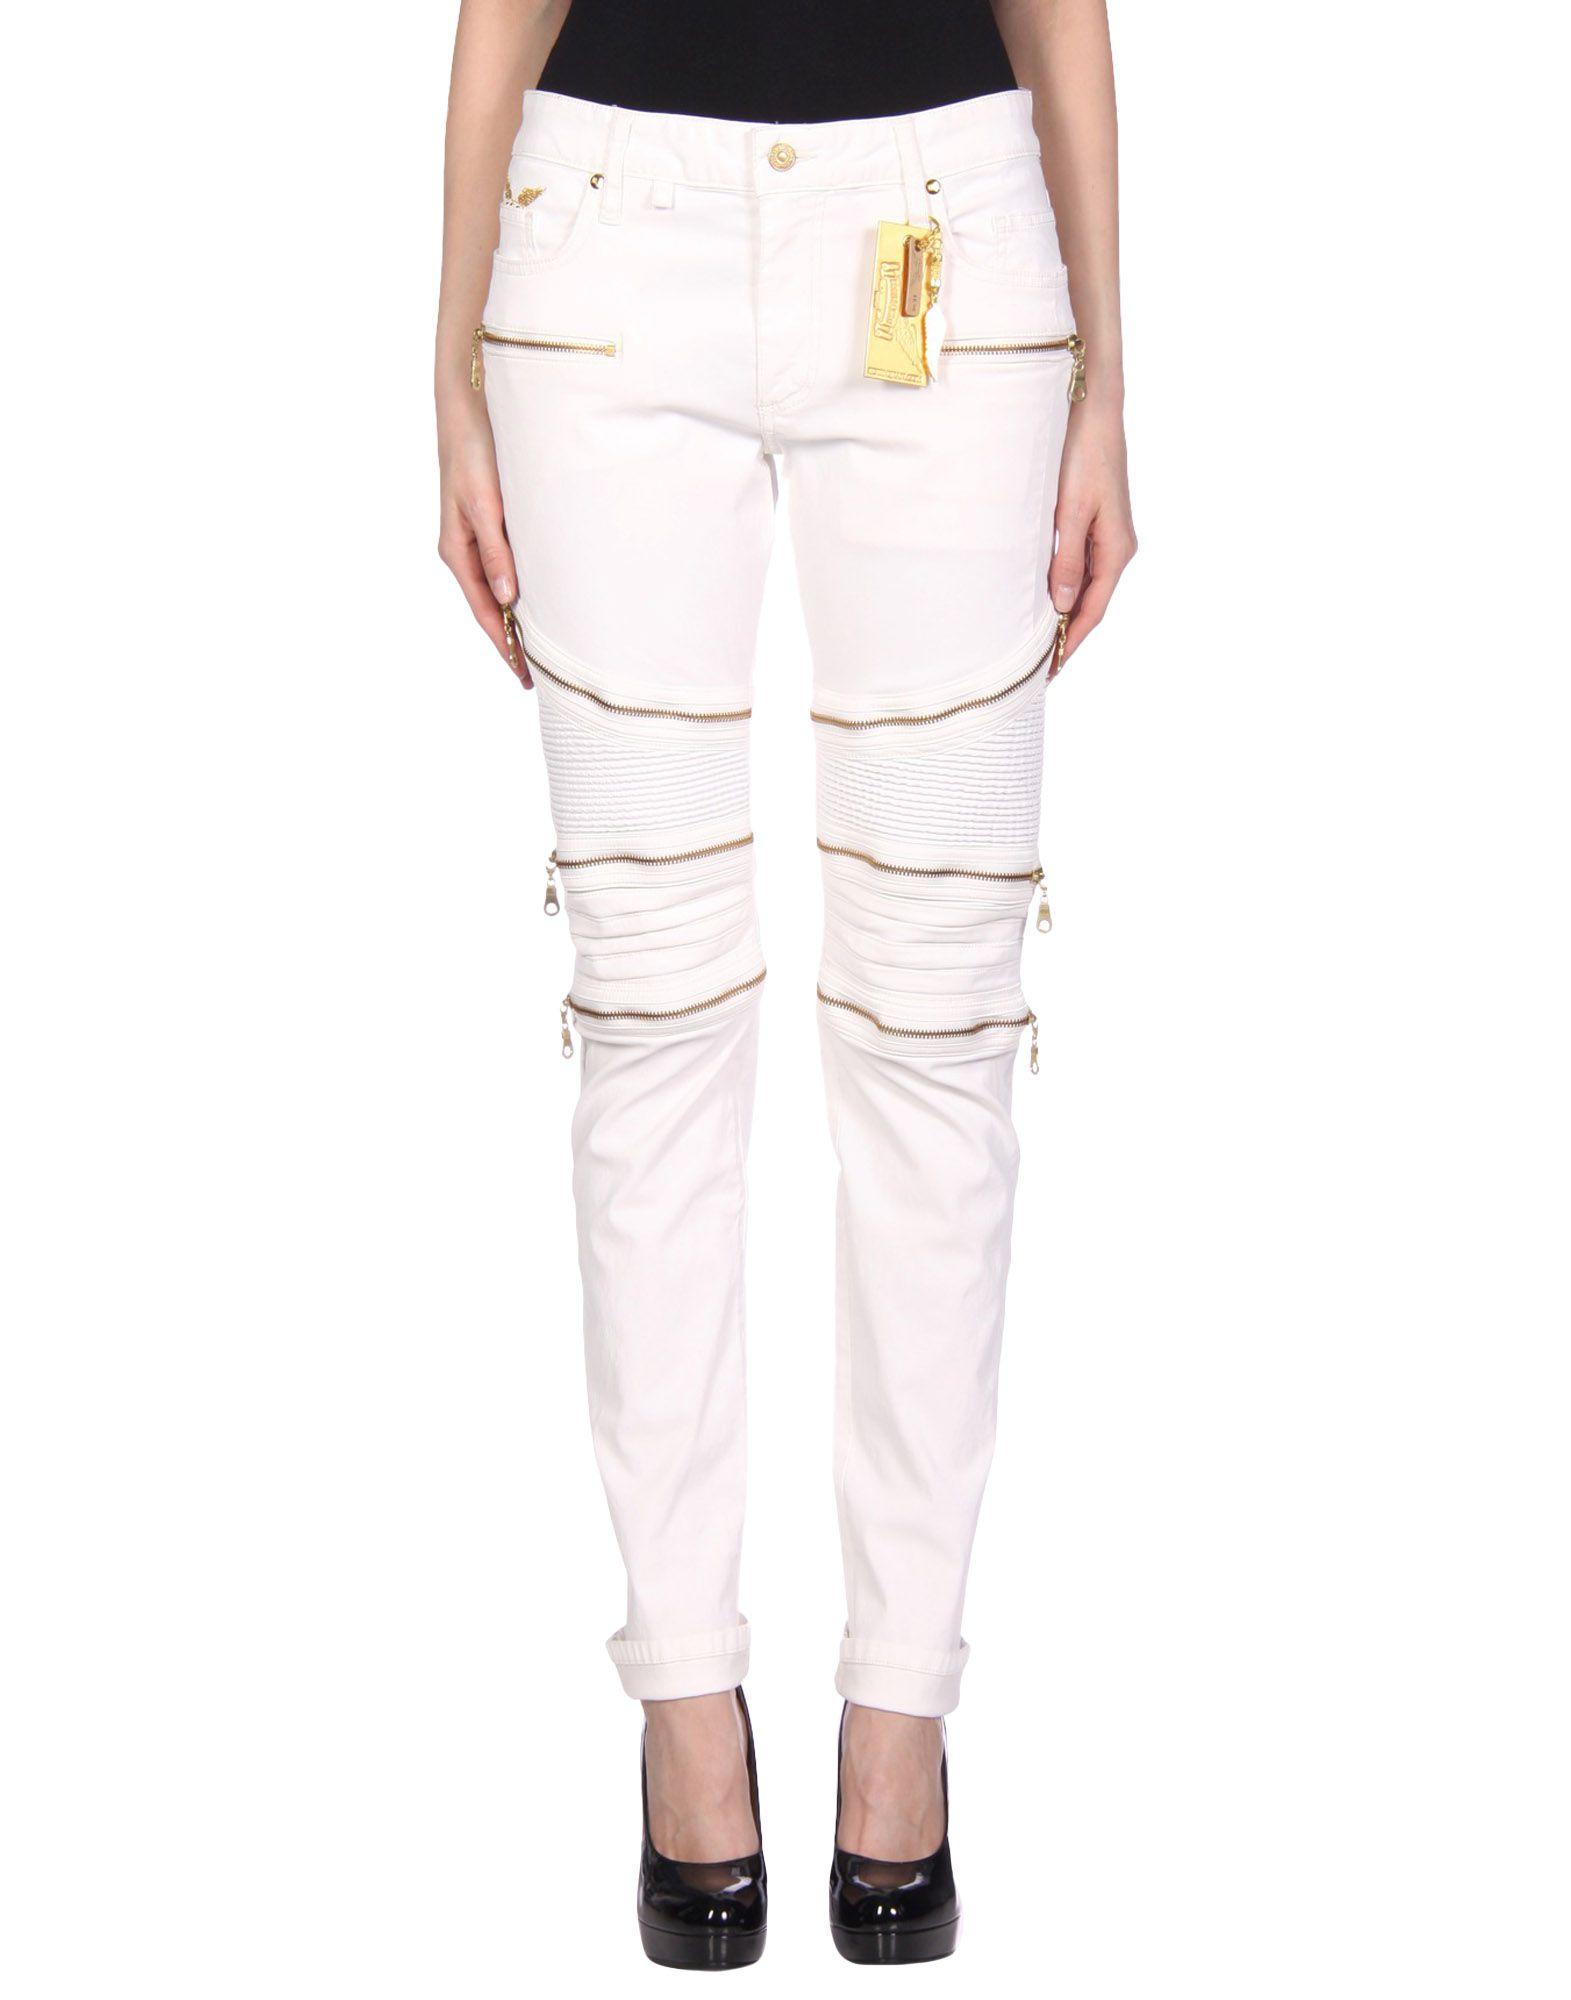 ROBIN'S JEAN Casual Pants in White